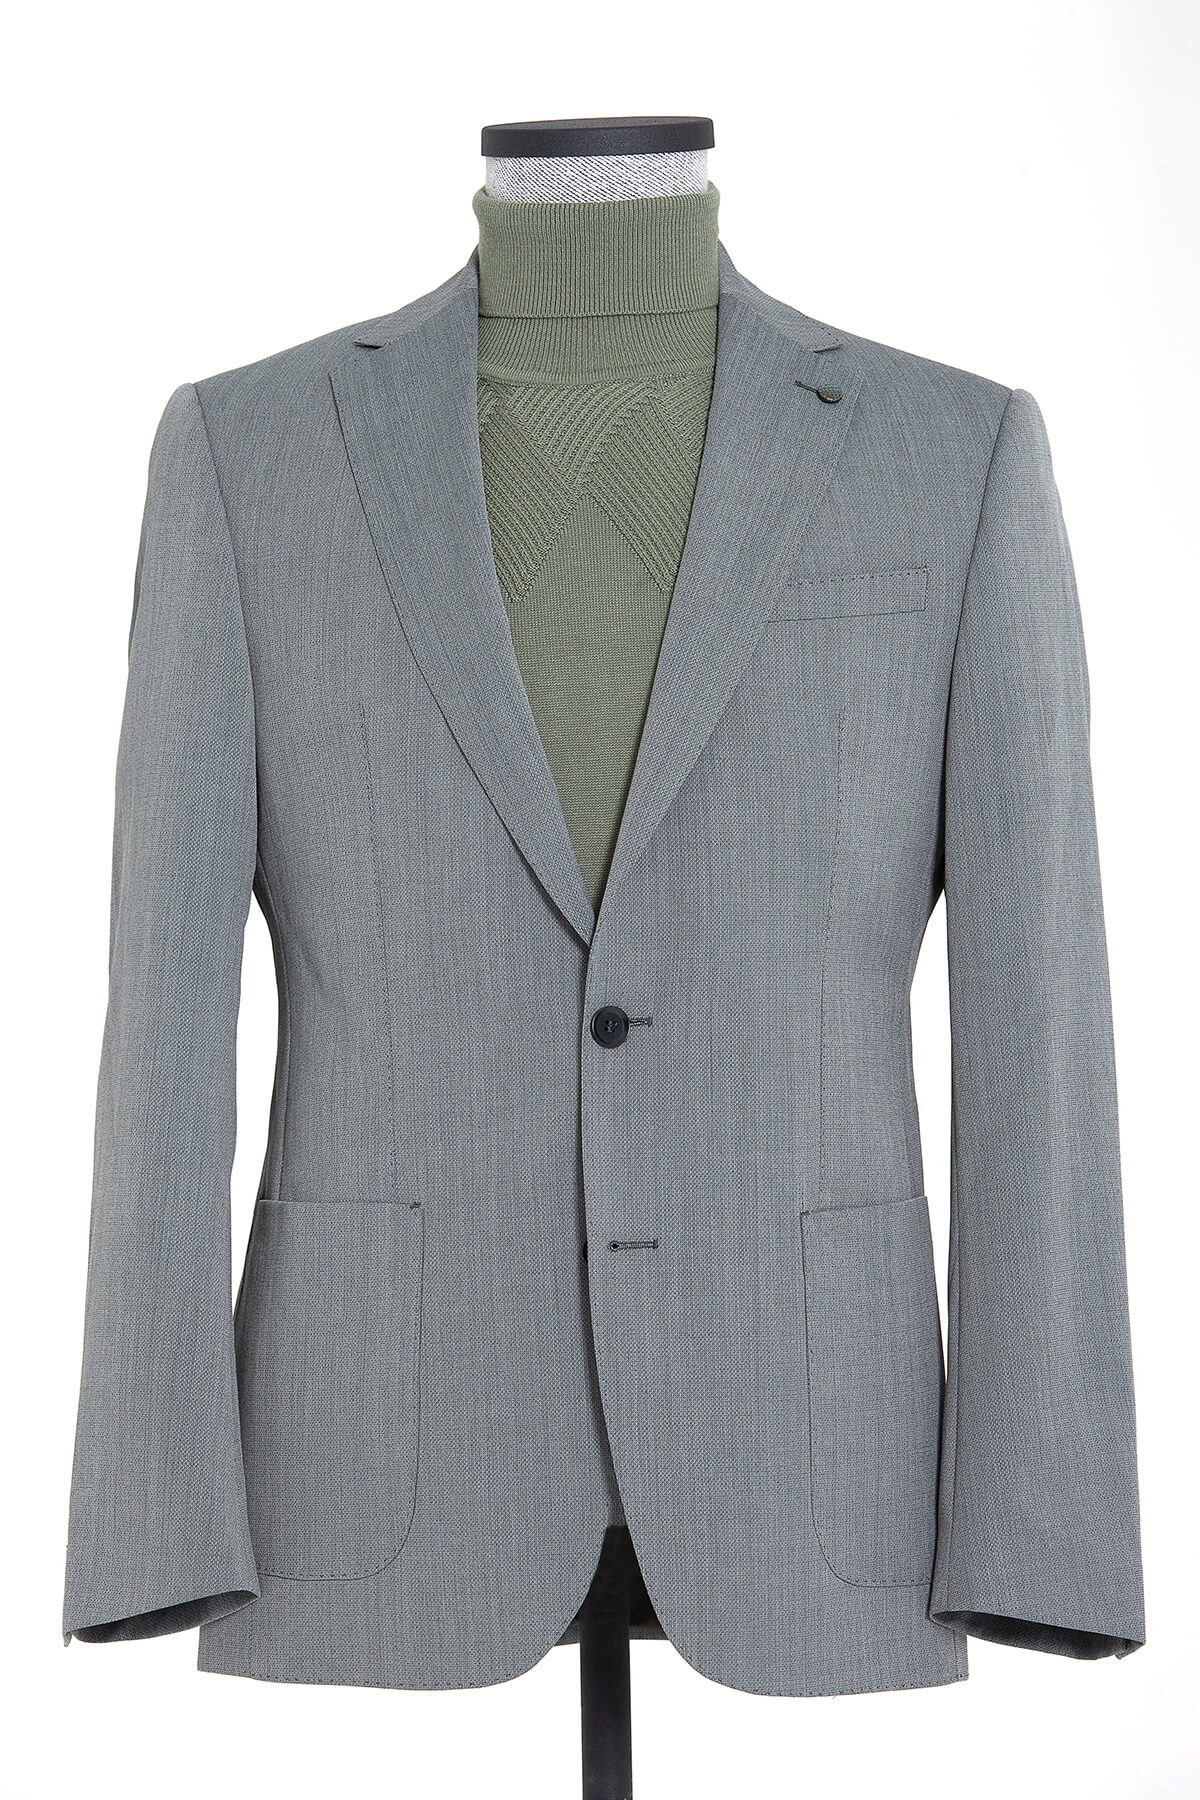 Yeşil Desenli Slim Fit Ceket - Thumbnail